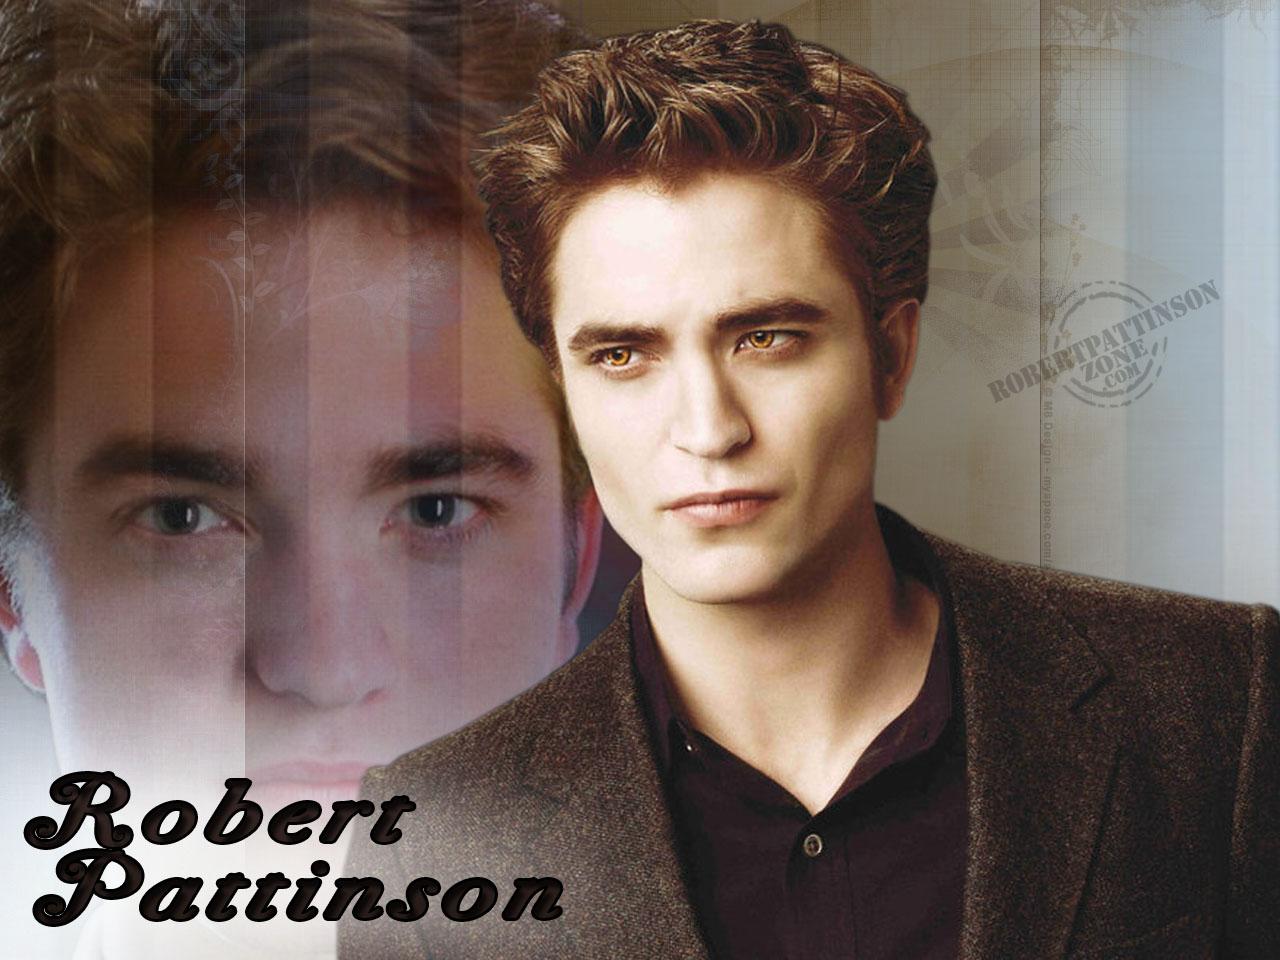 Robert Pattinson Wallpaper 7jpg